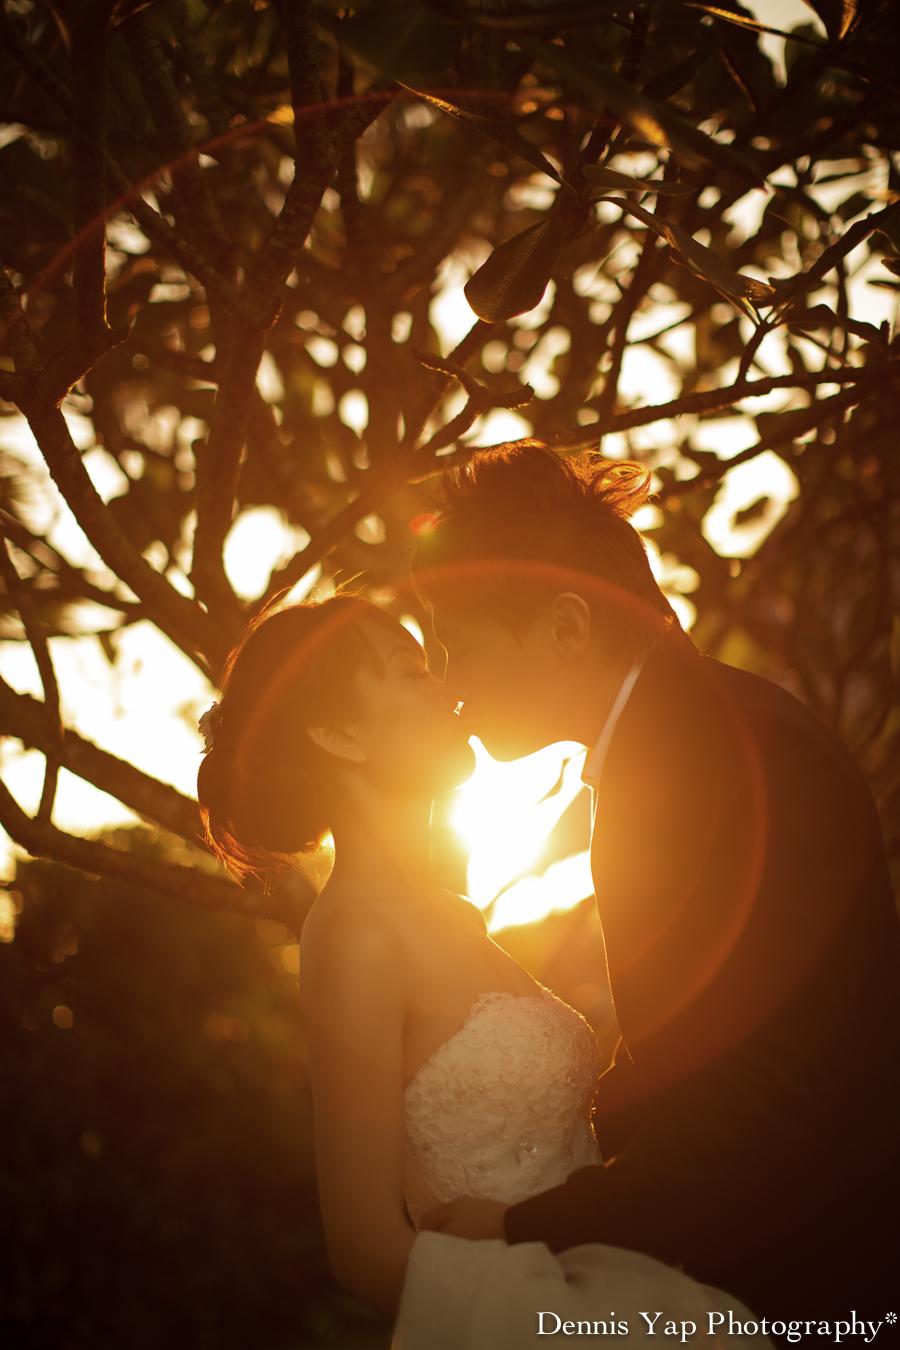 hwee jenna pre wedding bali indonesia dennis yap photography malaysia wedding photographer asia top 30 beloved-15.jpg